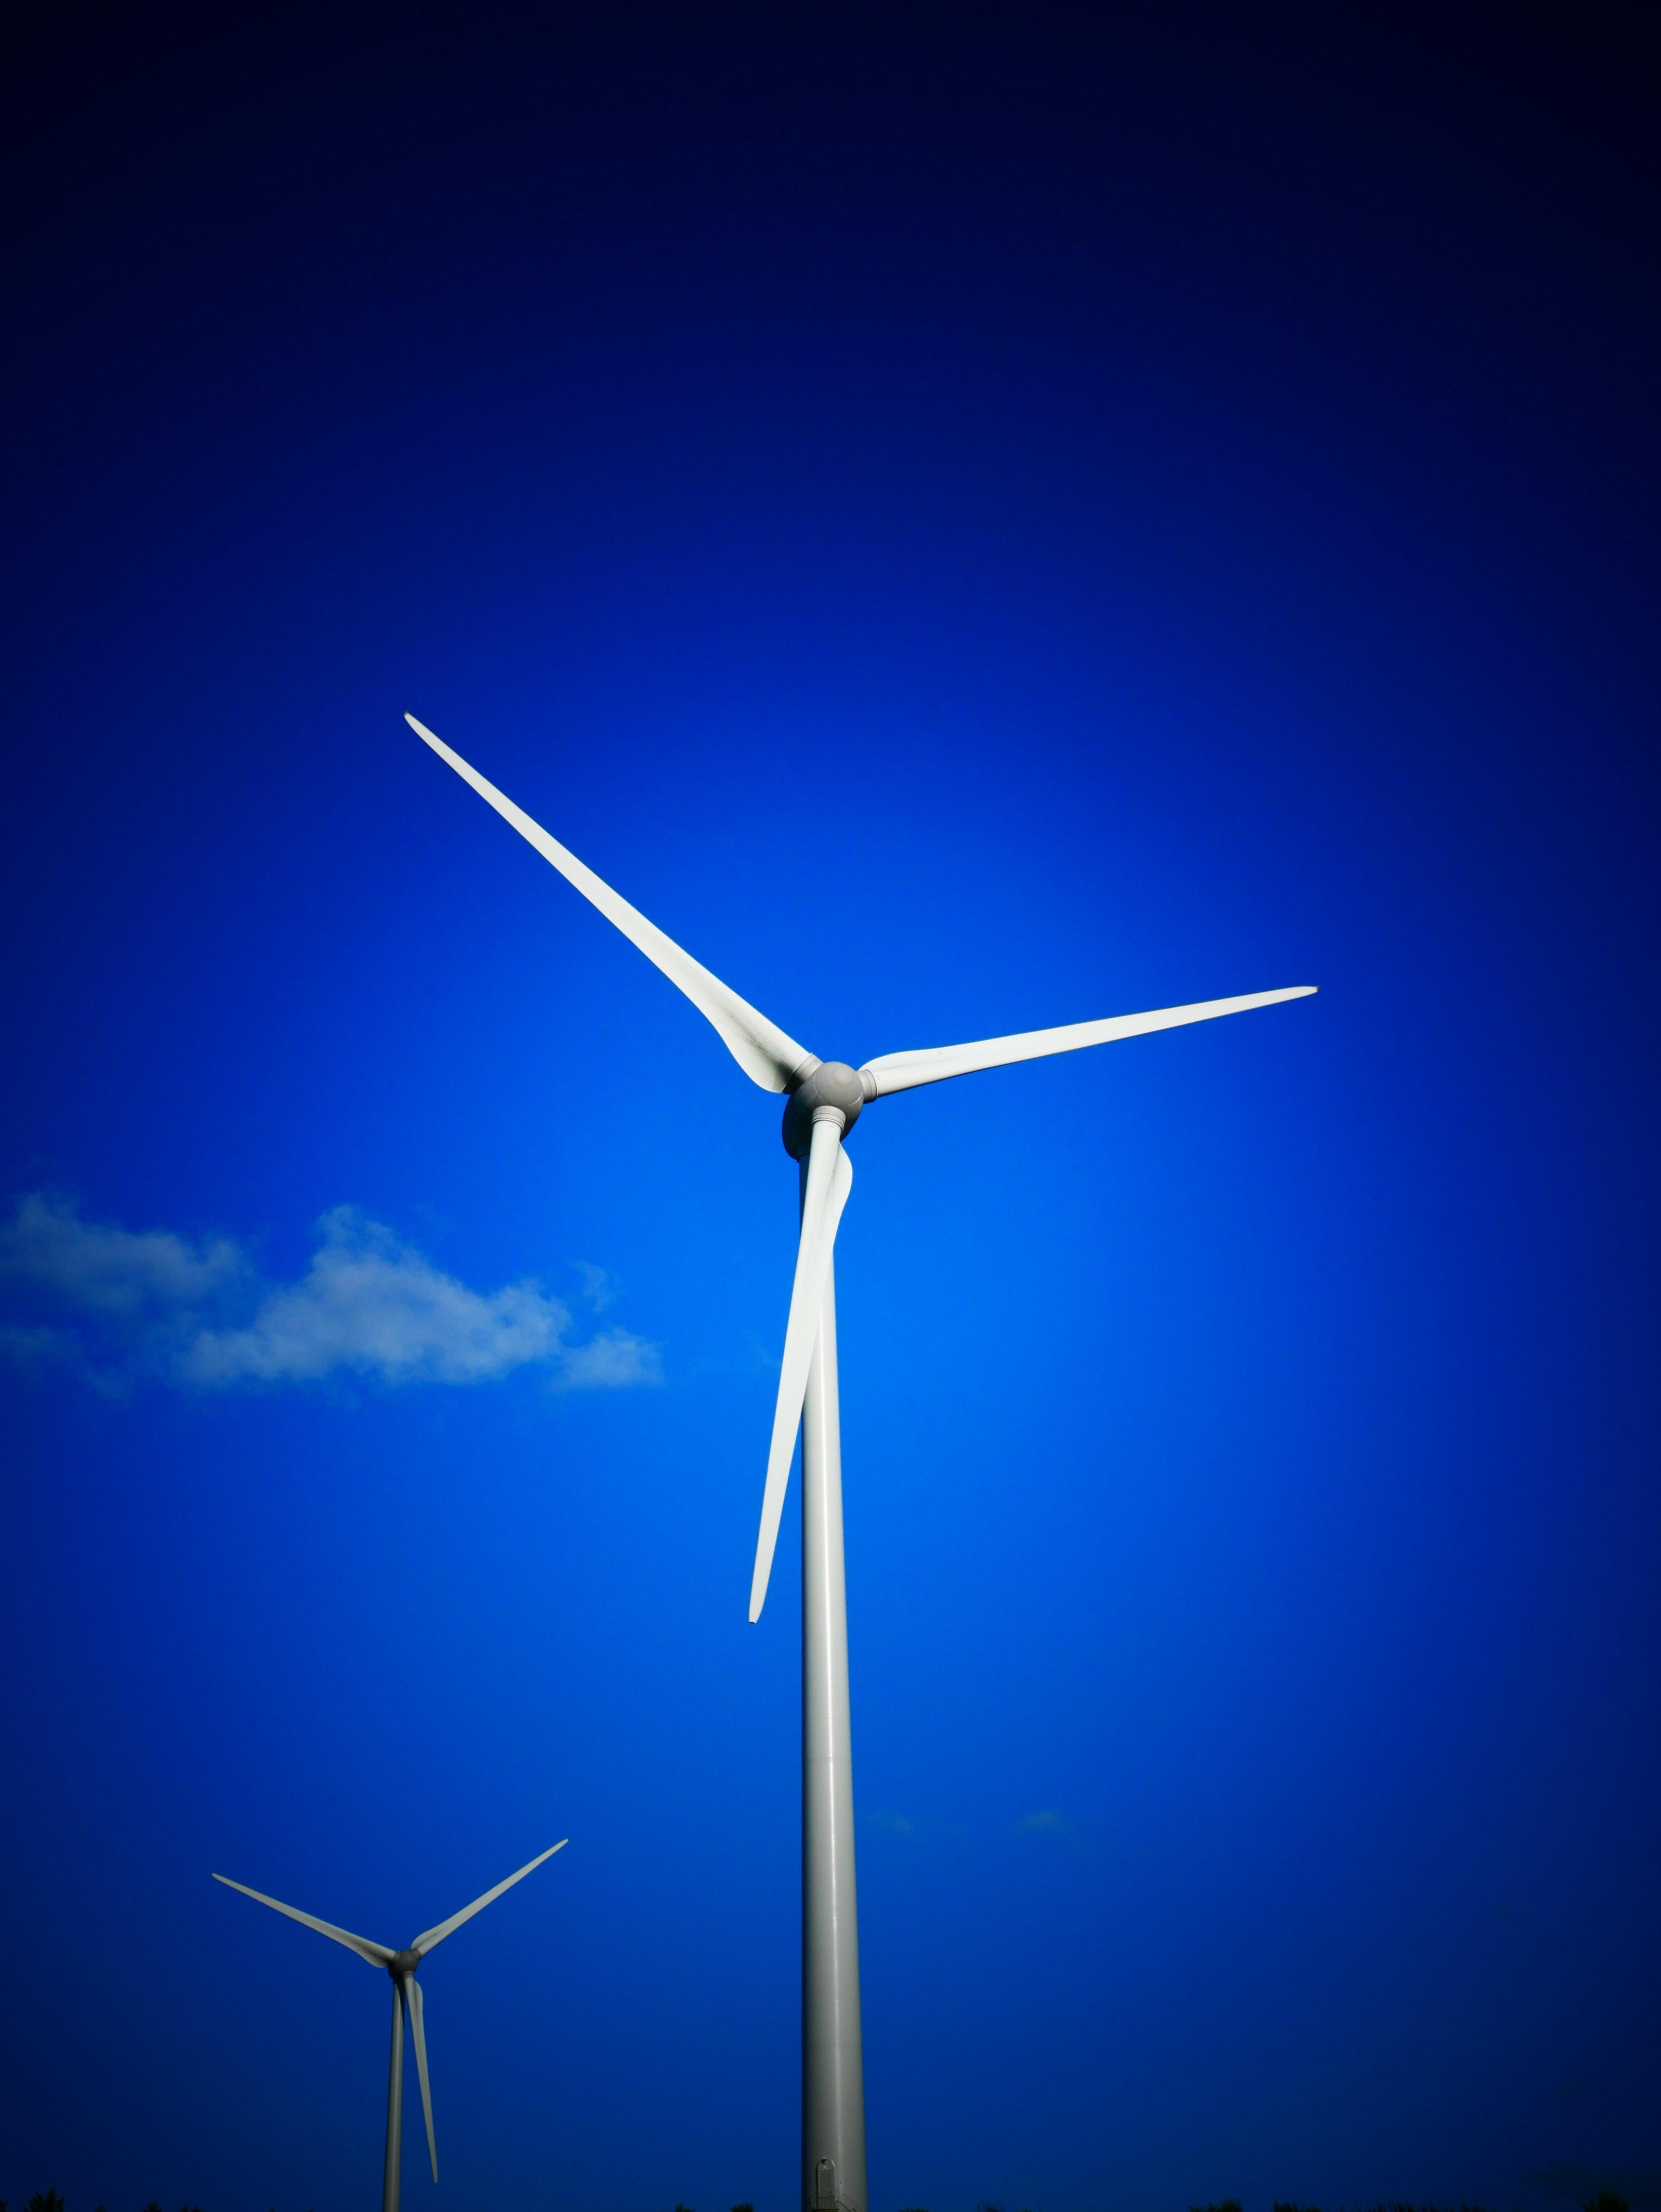 3 Blade Windmill 183 Free Stock Photo